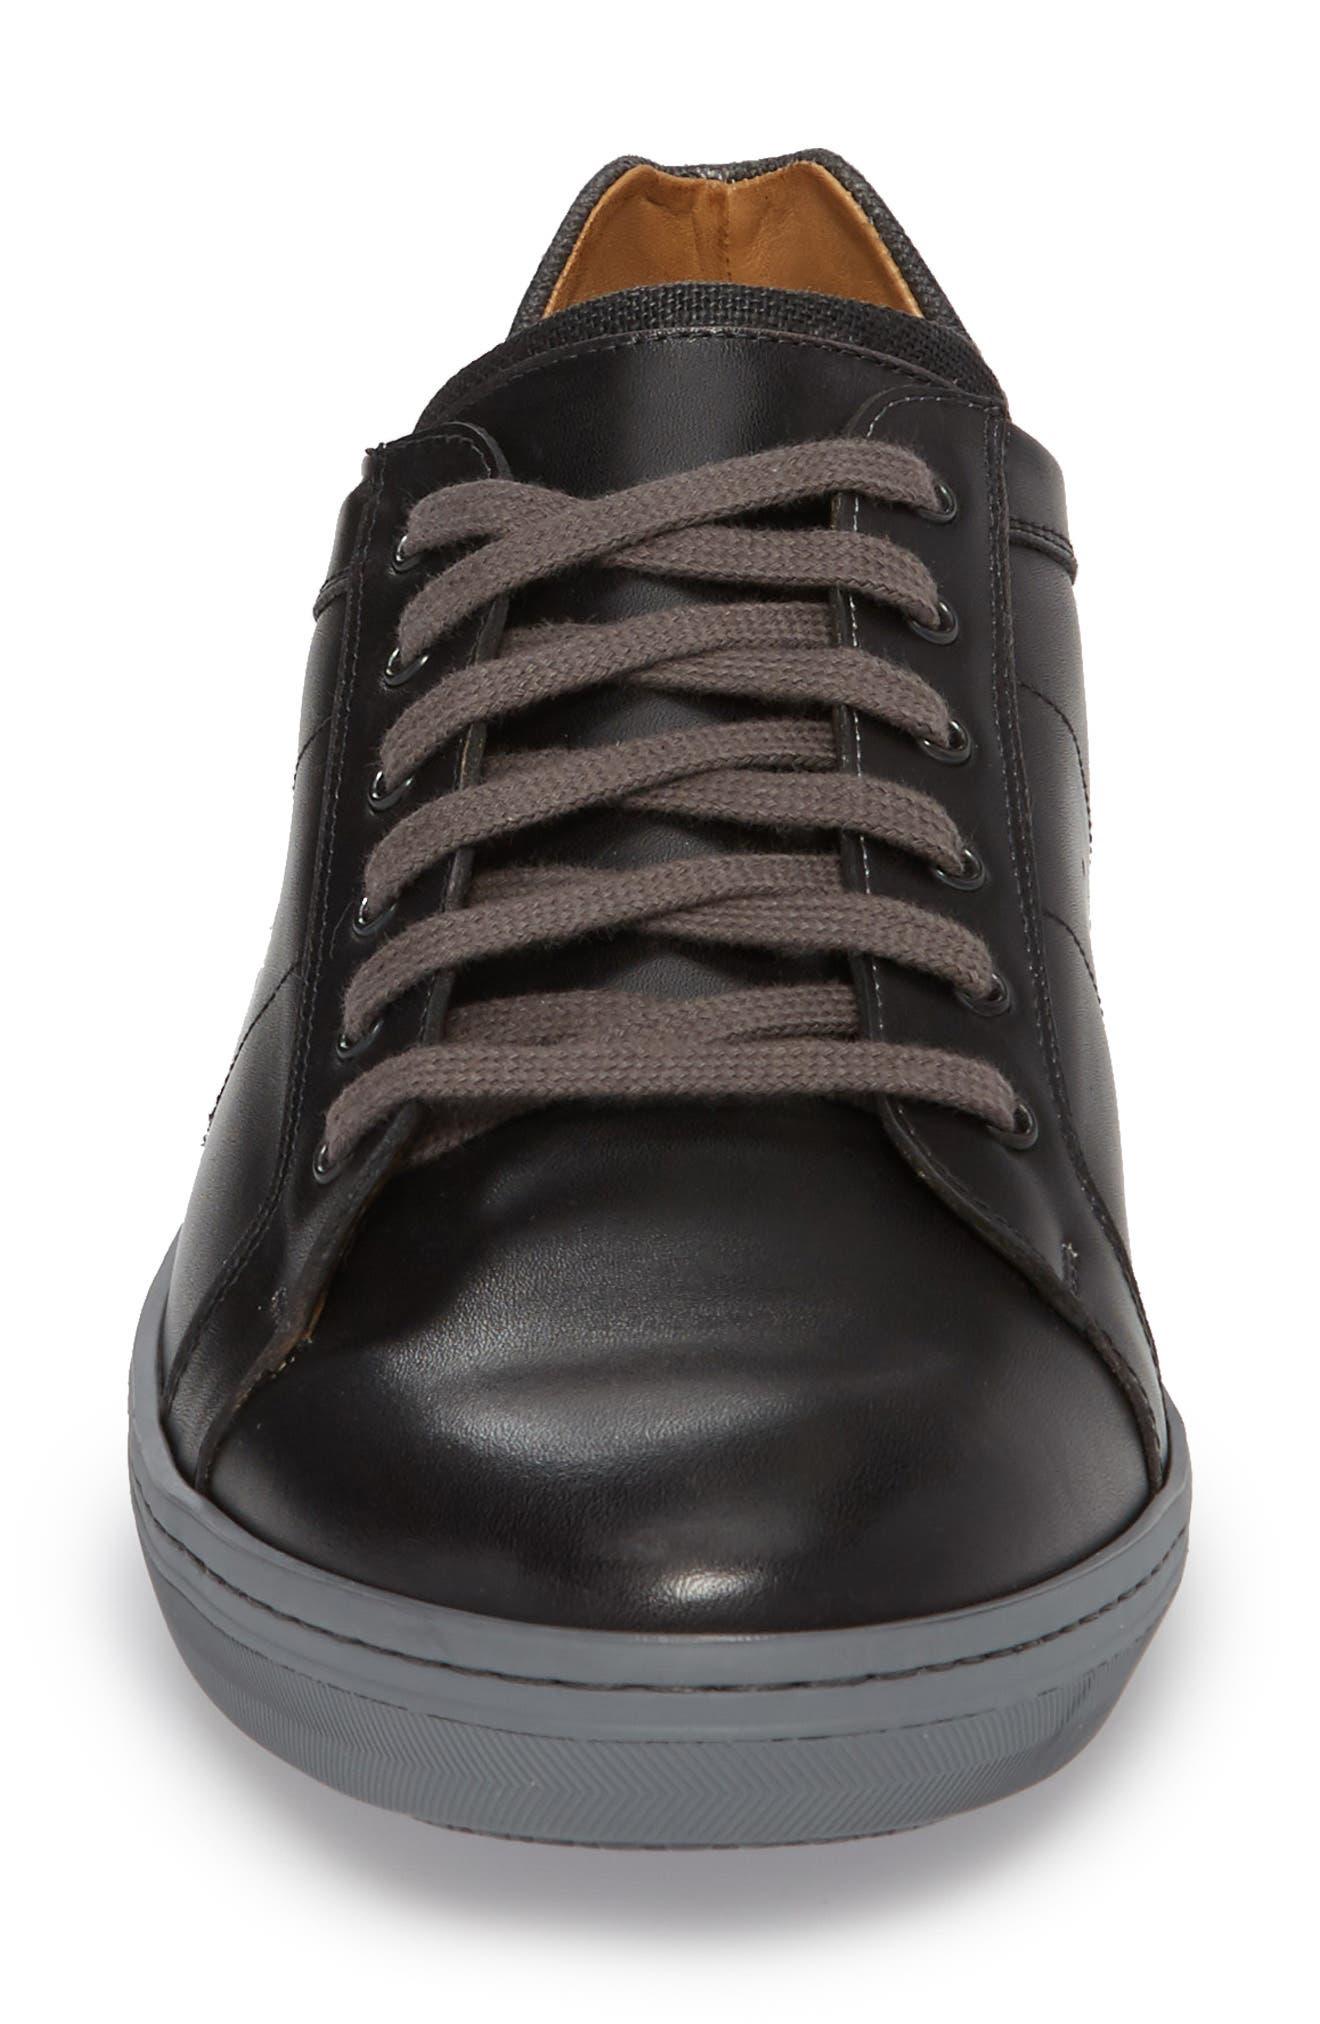 Cuzco Sneaker,                             Alternate thumbnail 4, color,                             GRAPHITE/ BLACK LEATHER